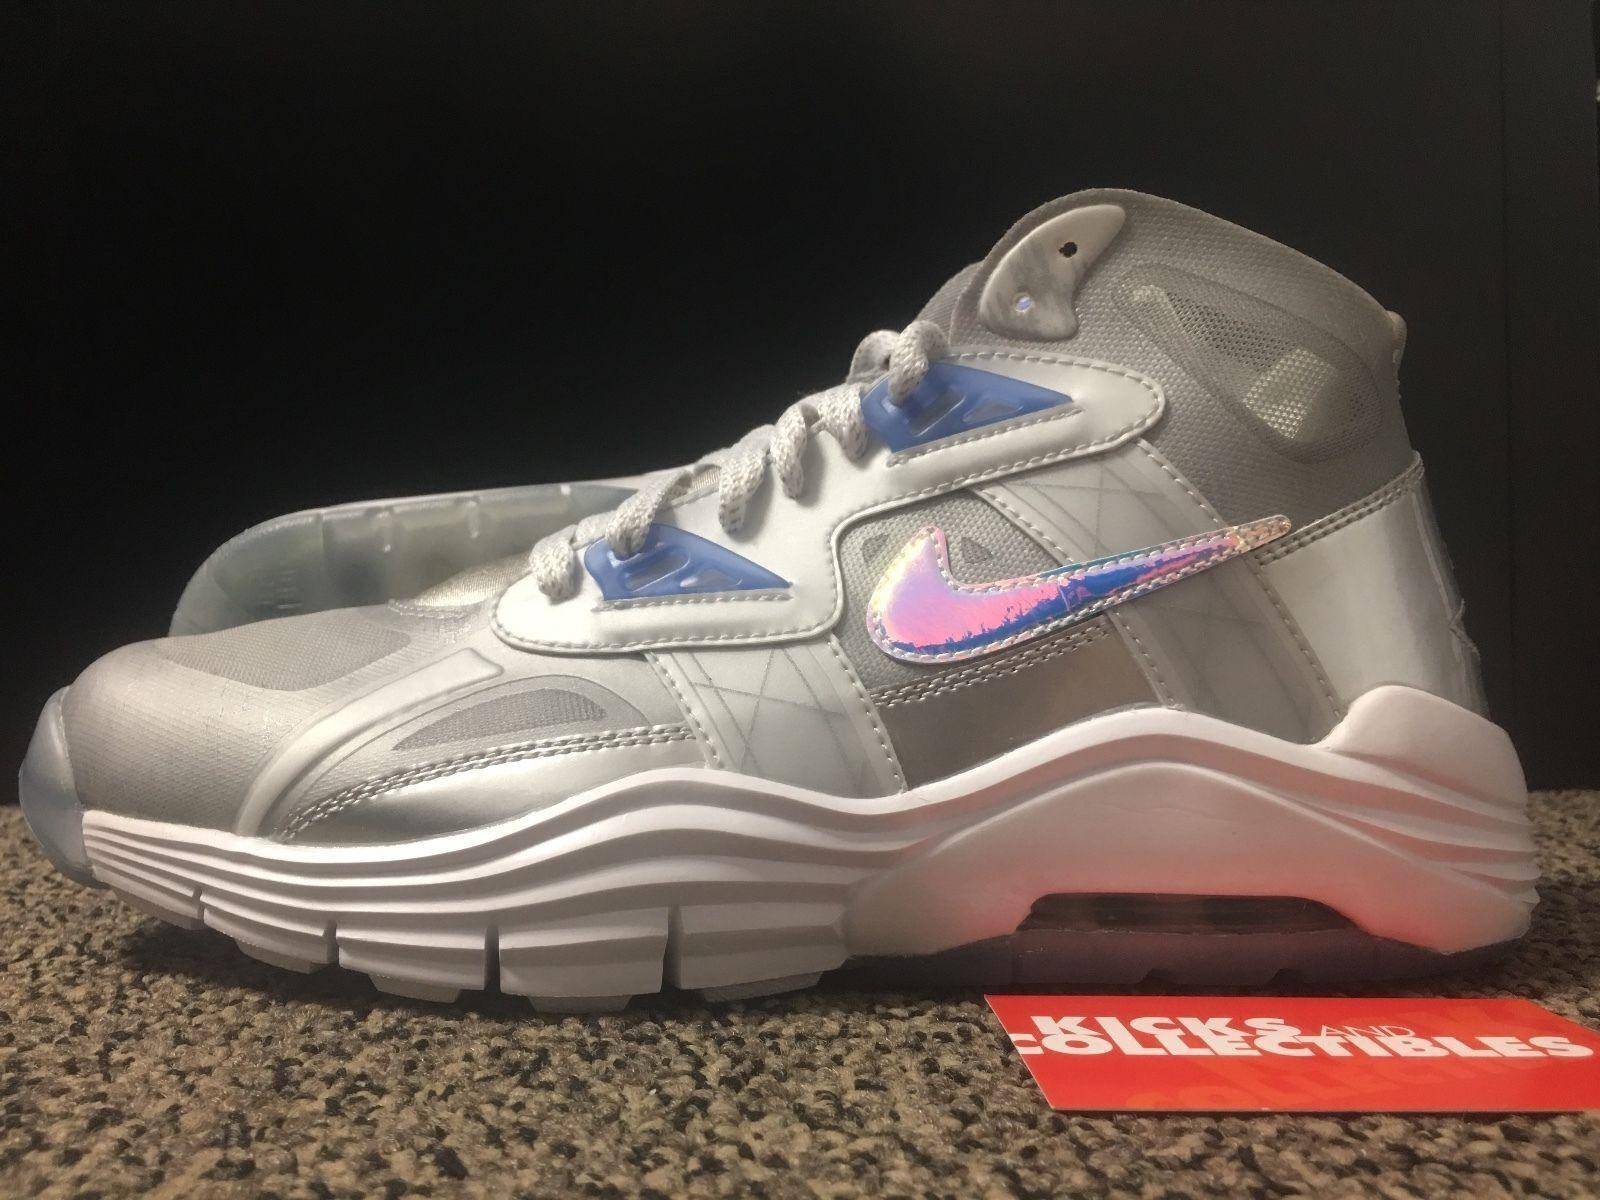 Nike 646797 001 lunar 180 trainer sc qs 11, 12 superbowl 13 argento blu ghiaccio superbowl 12 0b70b8